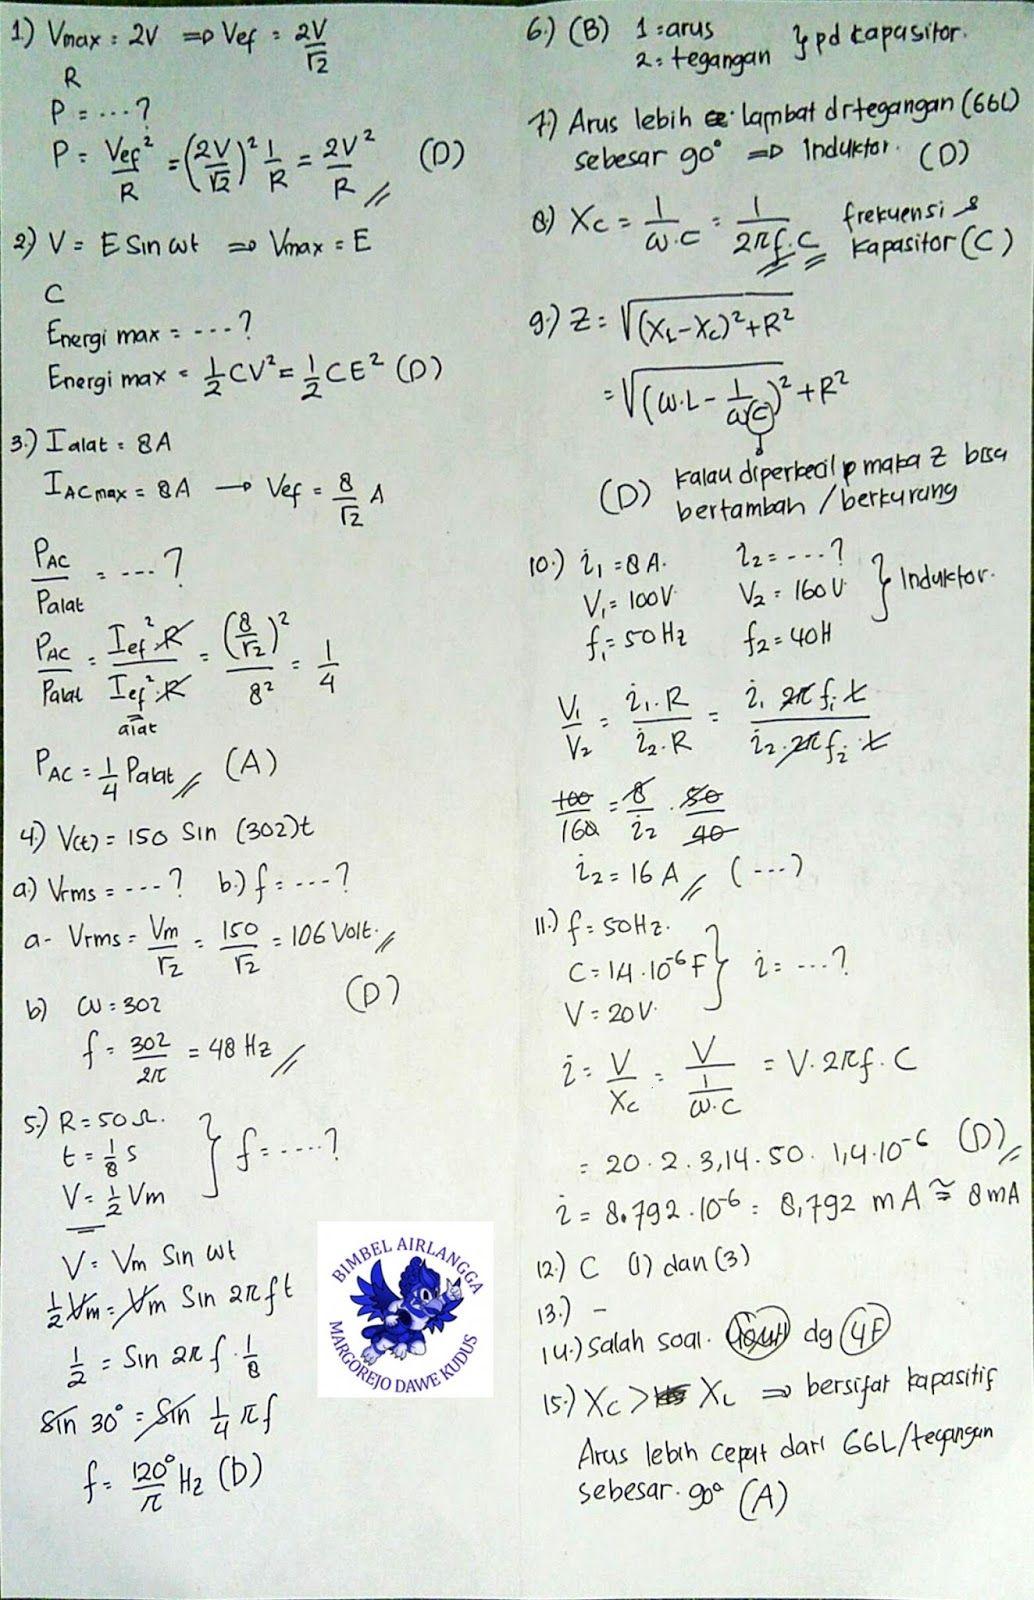 Penghianat Fisika Kunci Jawaban Fisika Xii Marthen Kanginan Kurikulum 2013 Bab Rangkaian Arus Searah Fisika Kurikulum Matematika